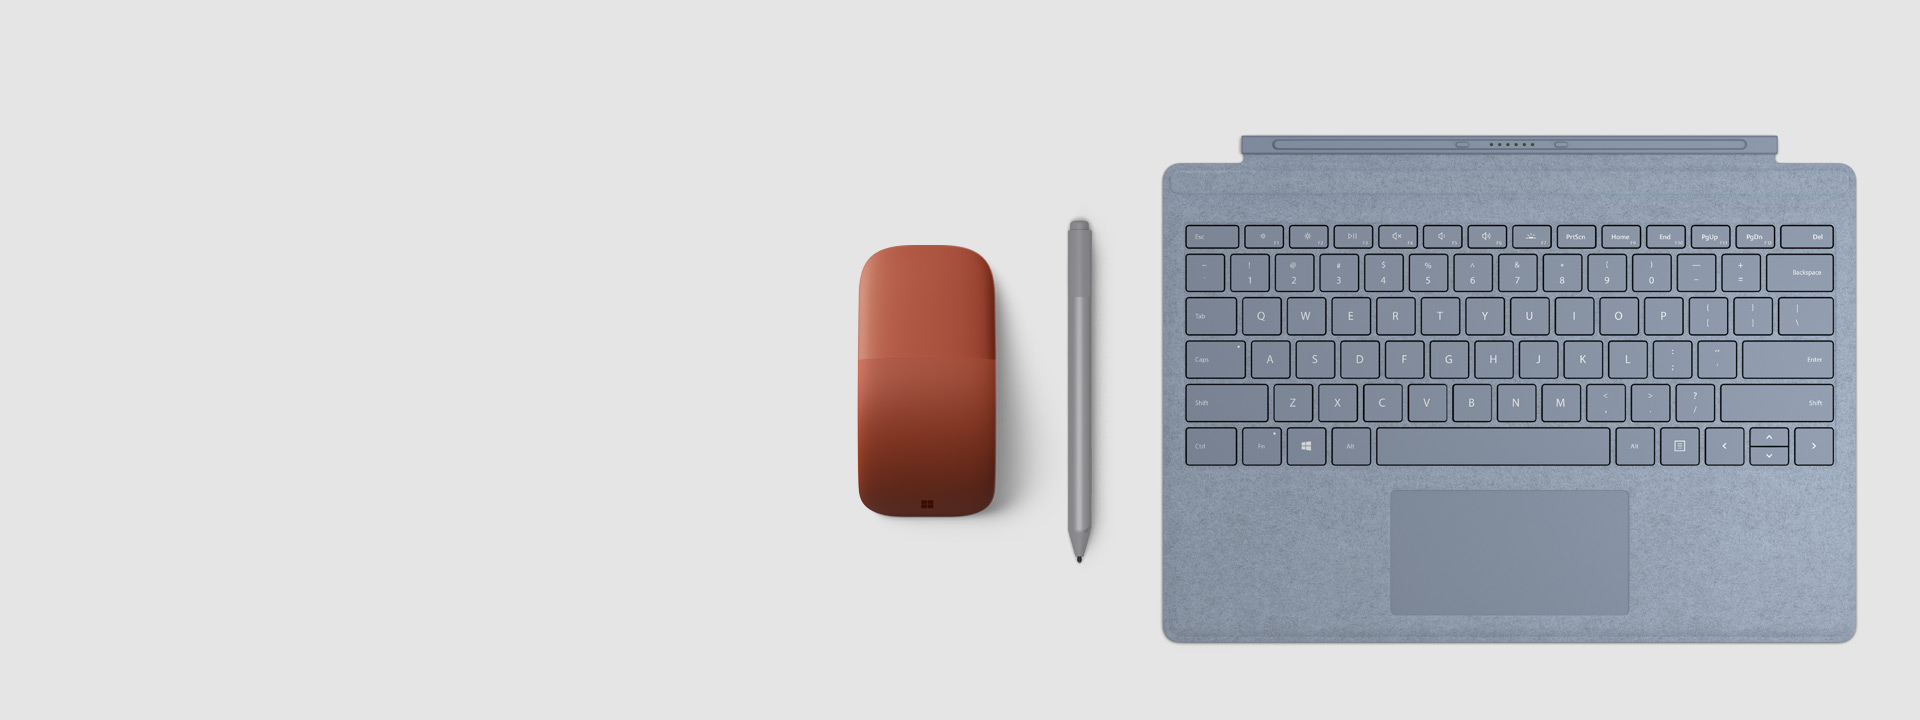 Lápiz para Surface, Funda con teclado Signature para Surface y Surface Arc Mouse